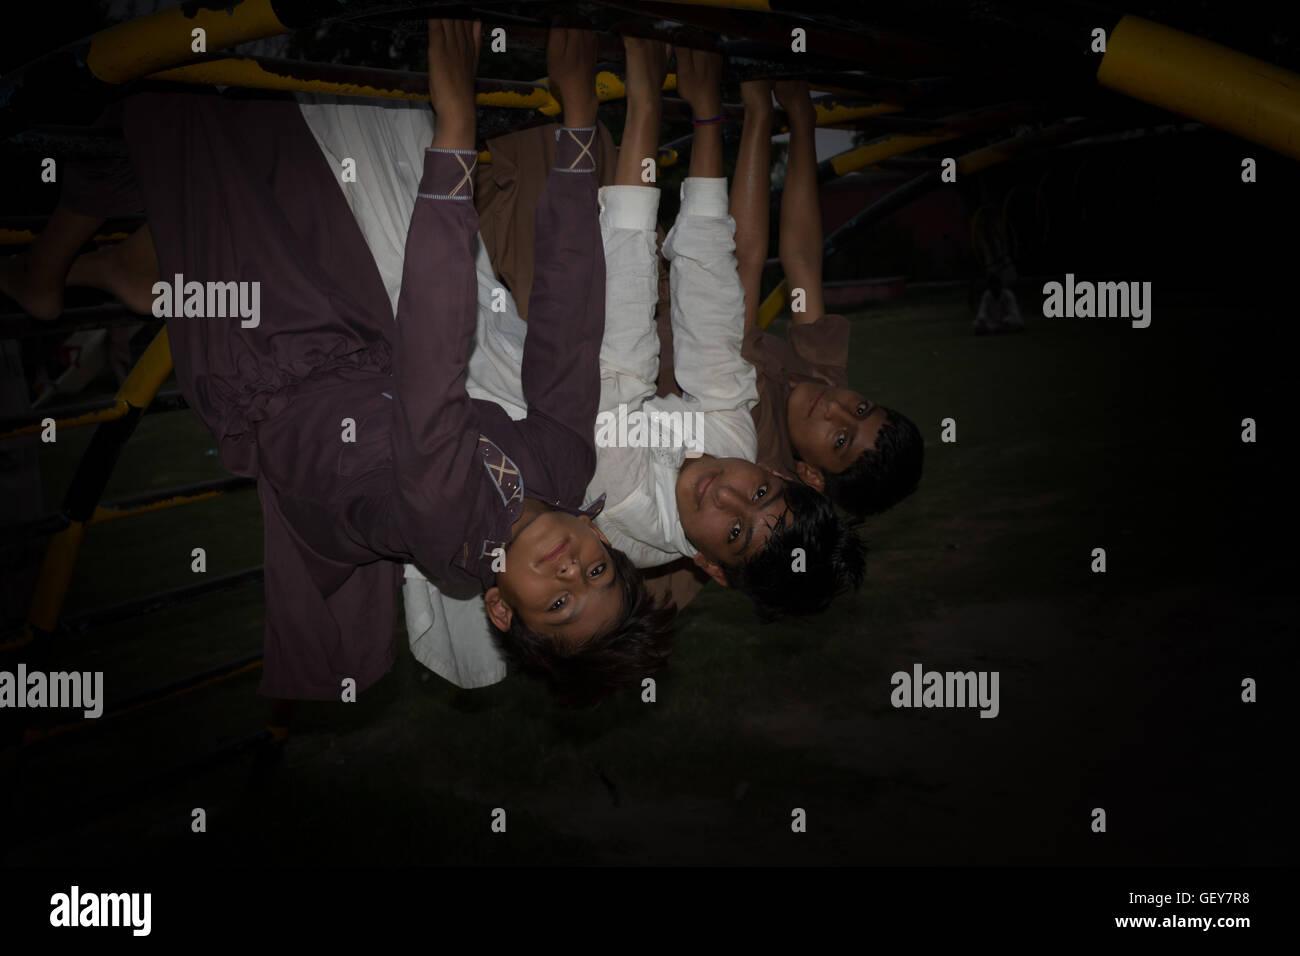 kids hanging upside down Stock Photo